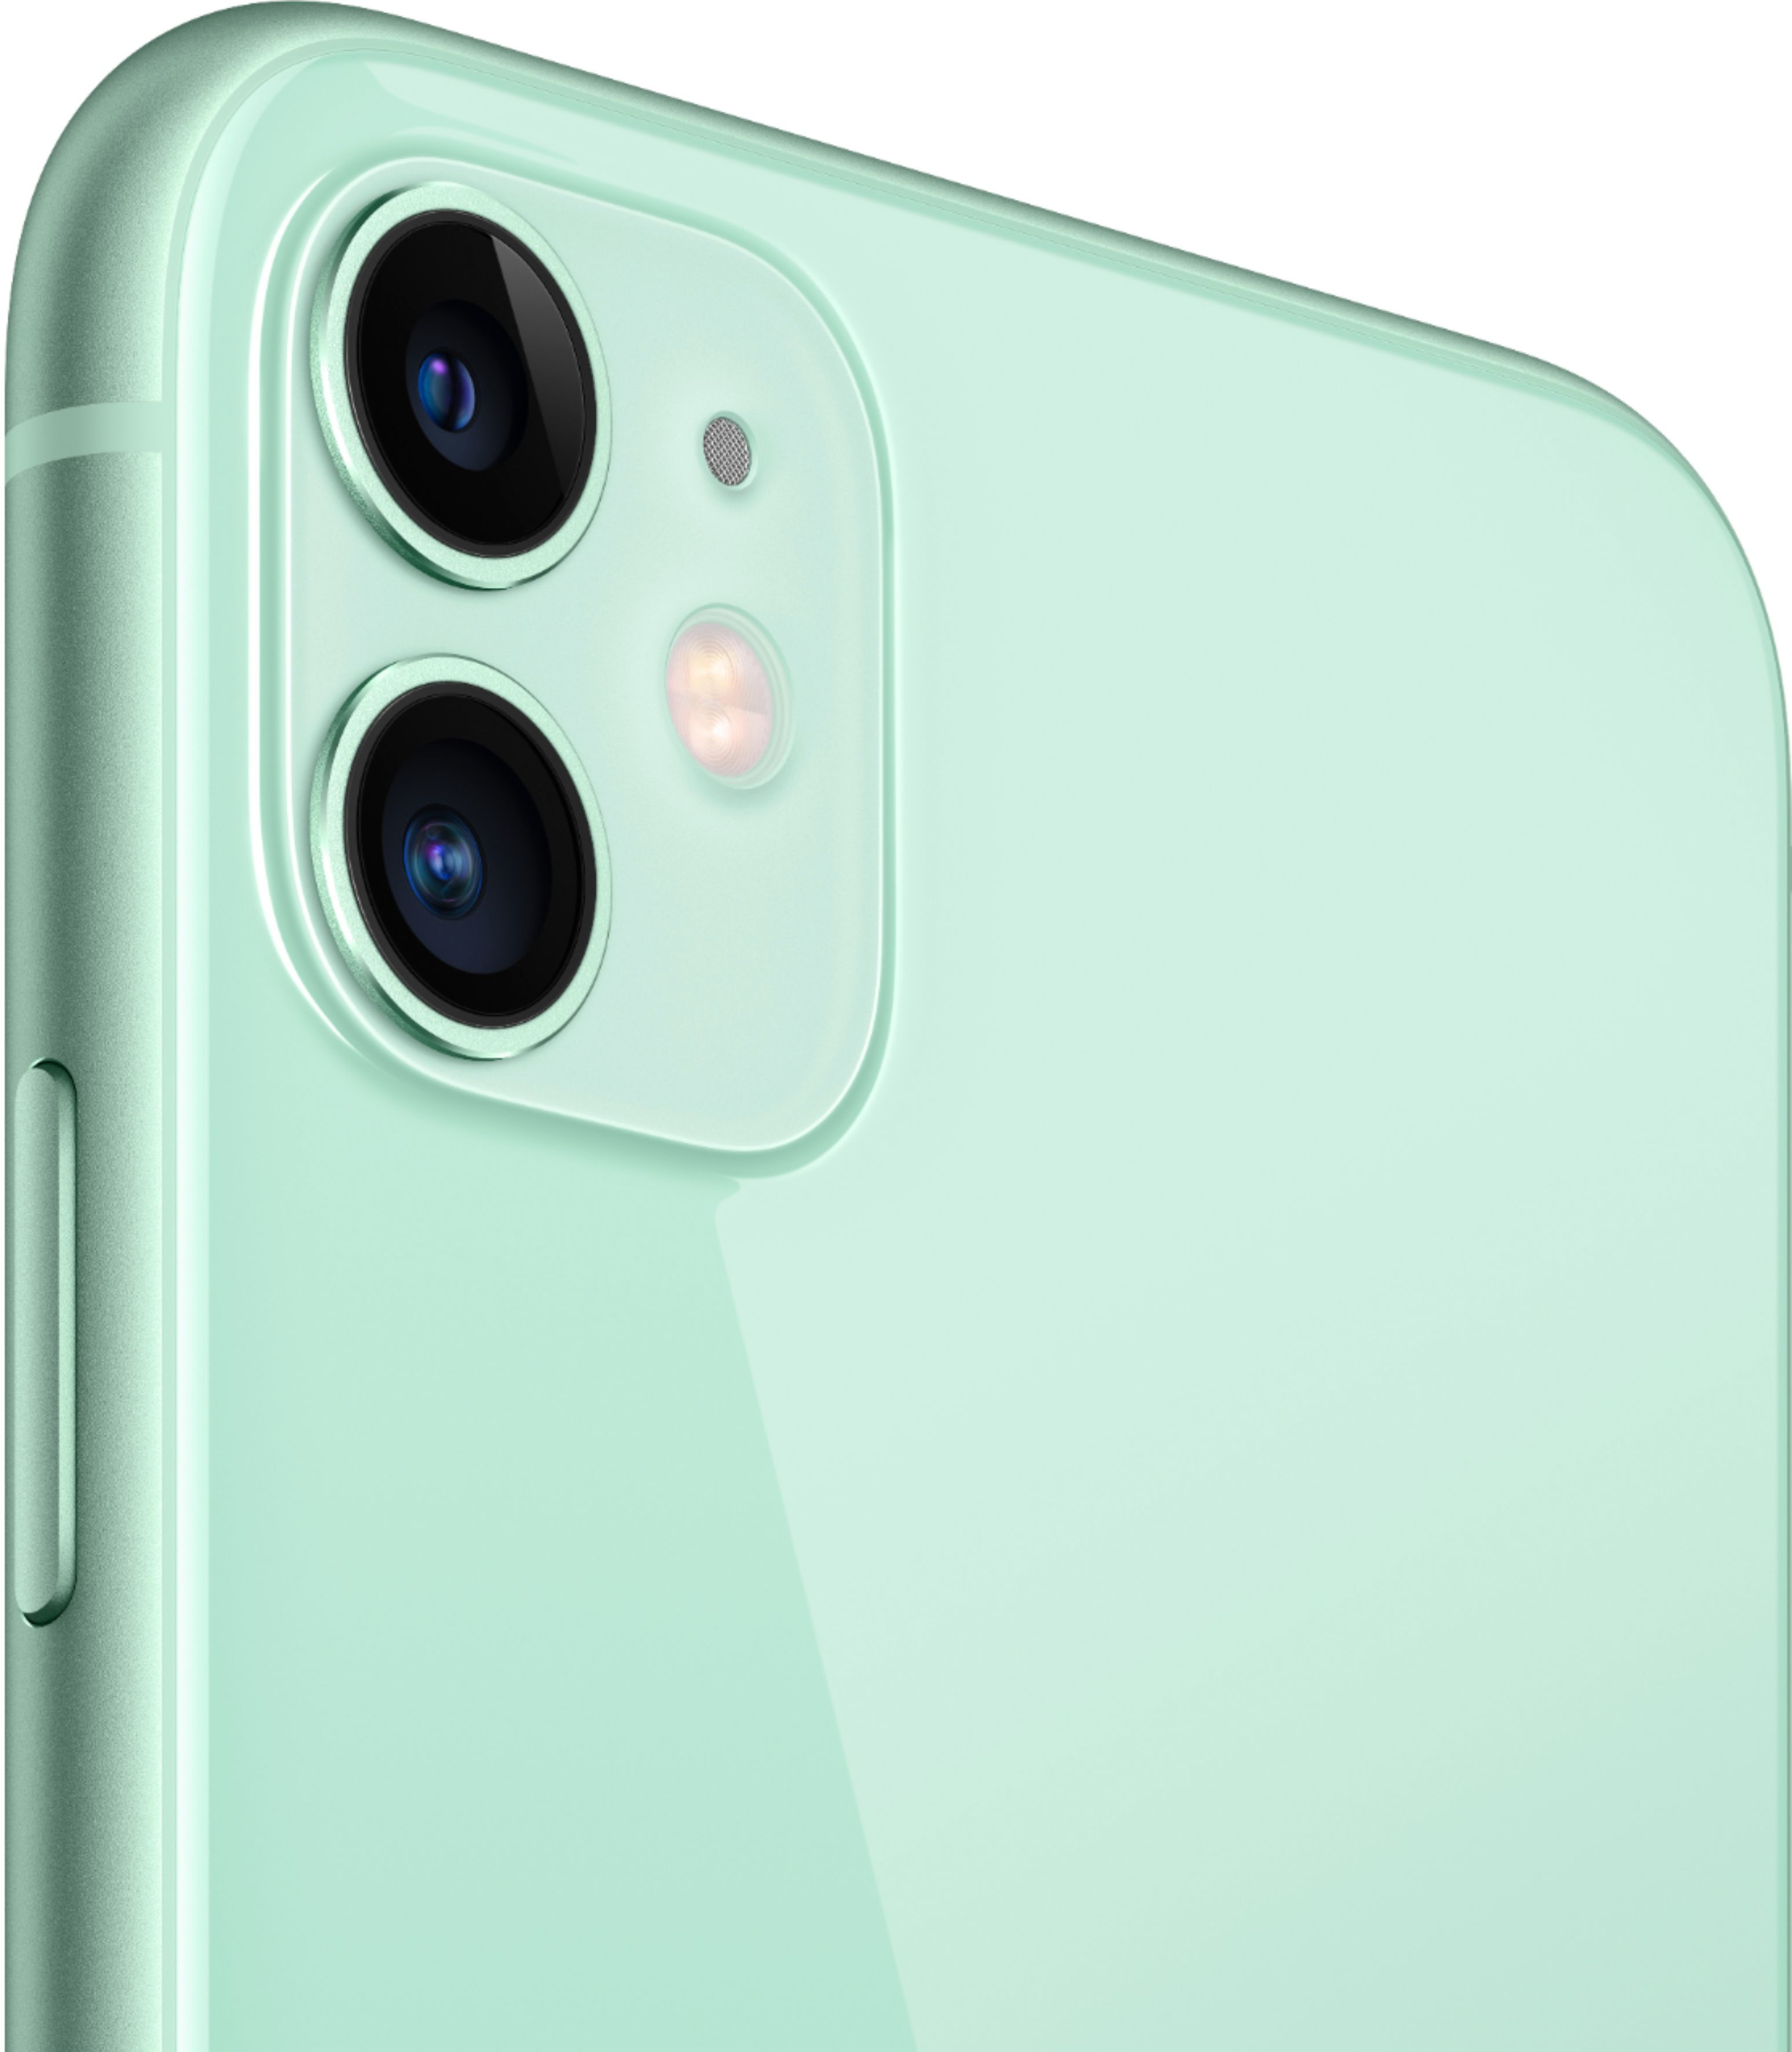 thumbnail 8 - Apple iPhone 11 64GB Factory Unlocked 4G LTE Smartphone